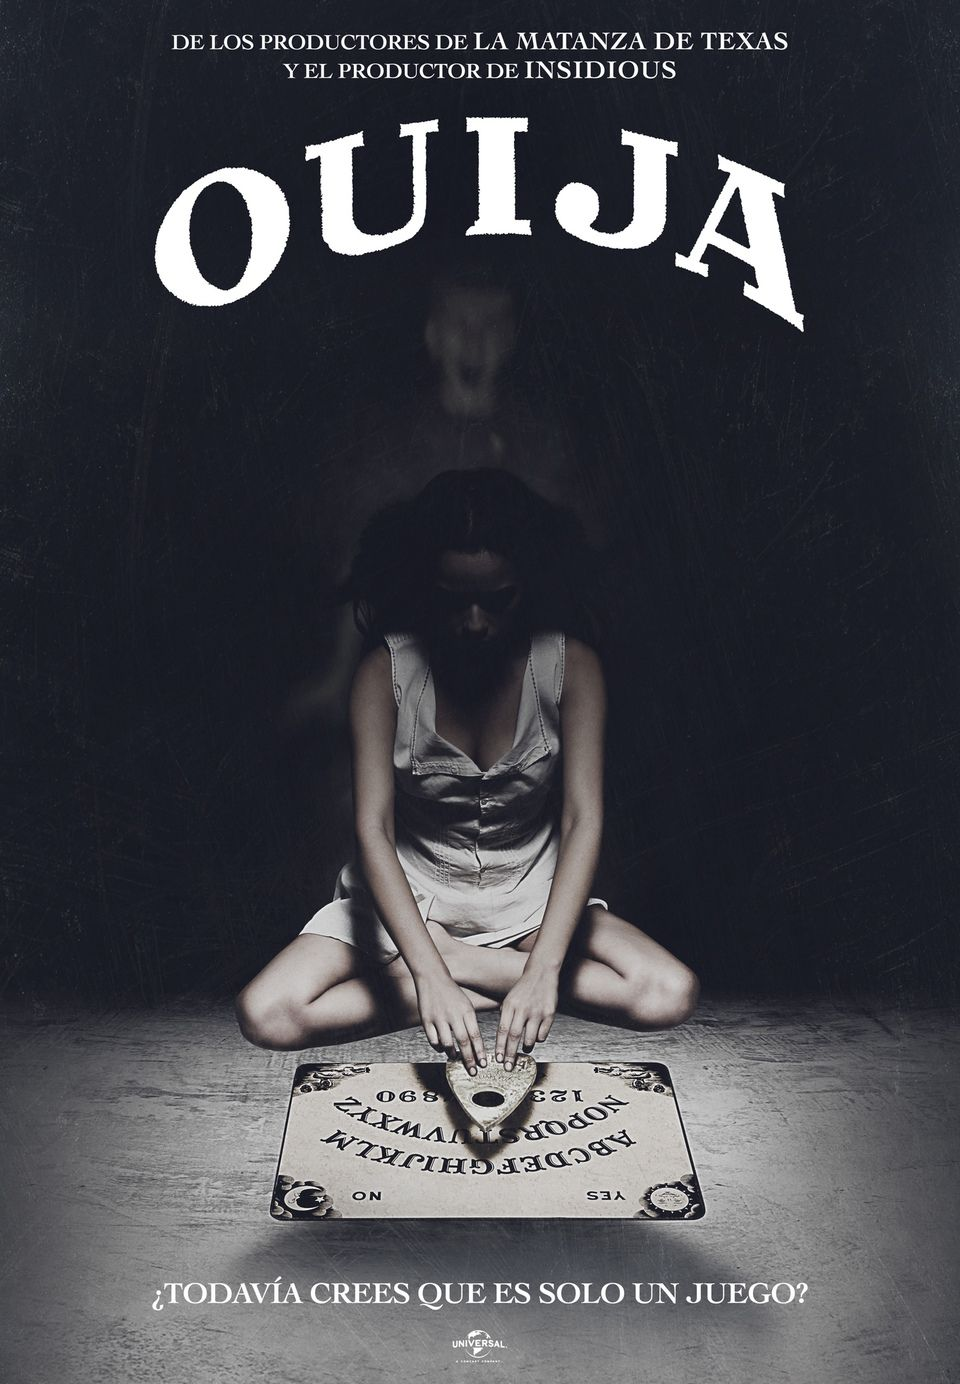 Critica De Ouija 2014 Blog De Nair Millos Ver Pelicula De Terror Ver Peliculas Ver Peliculas Gratis